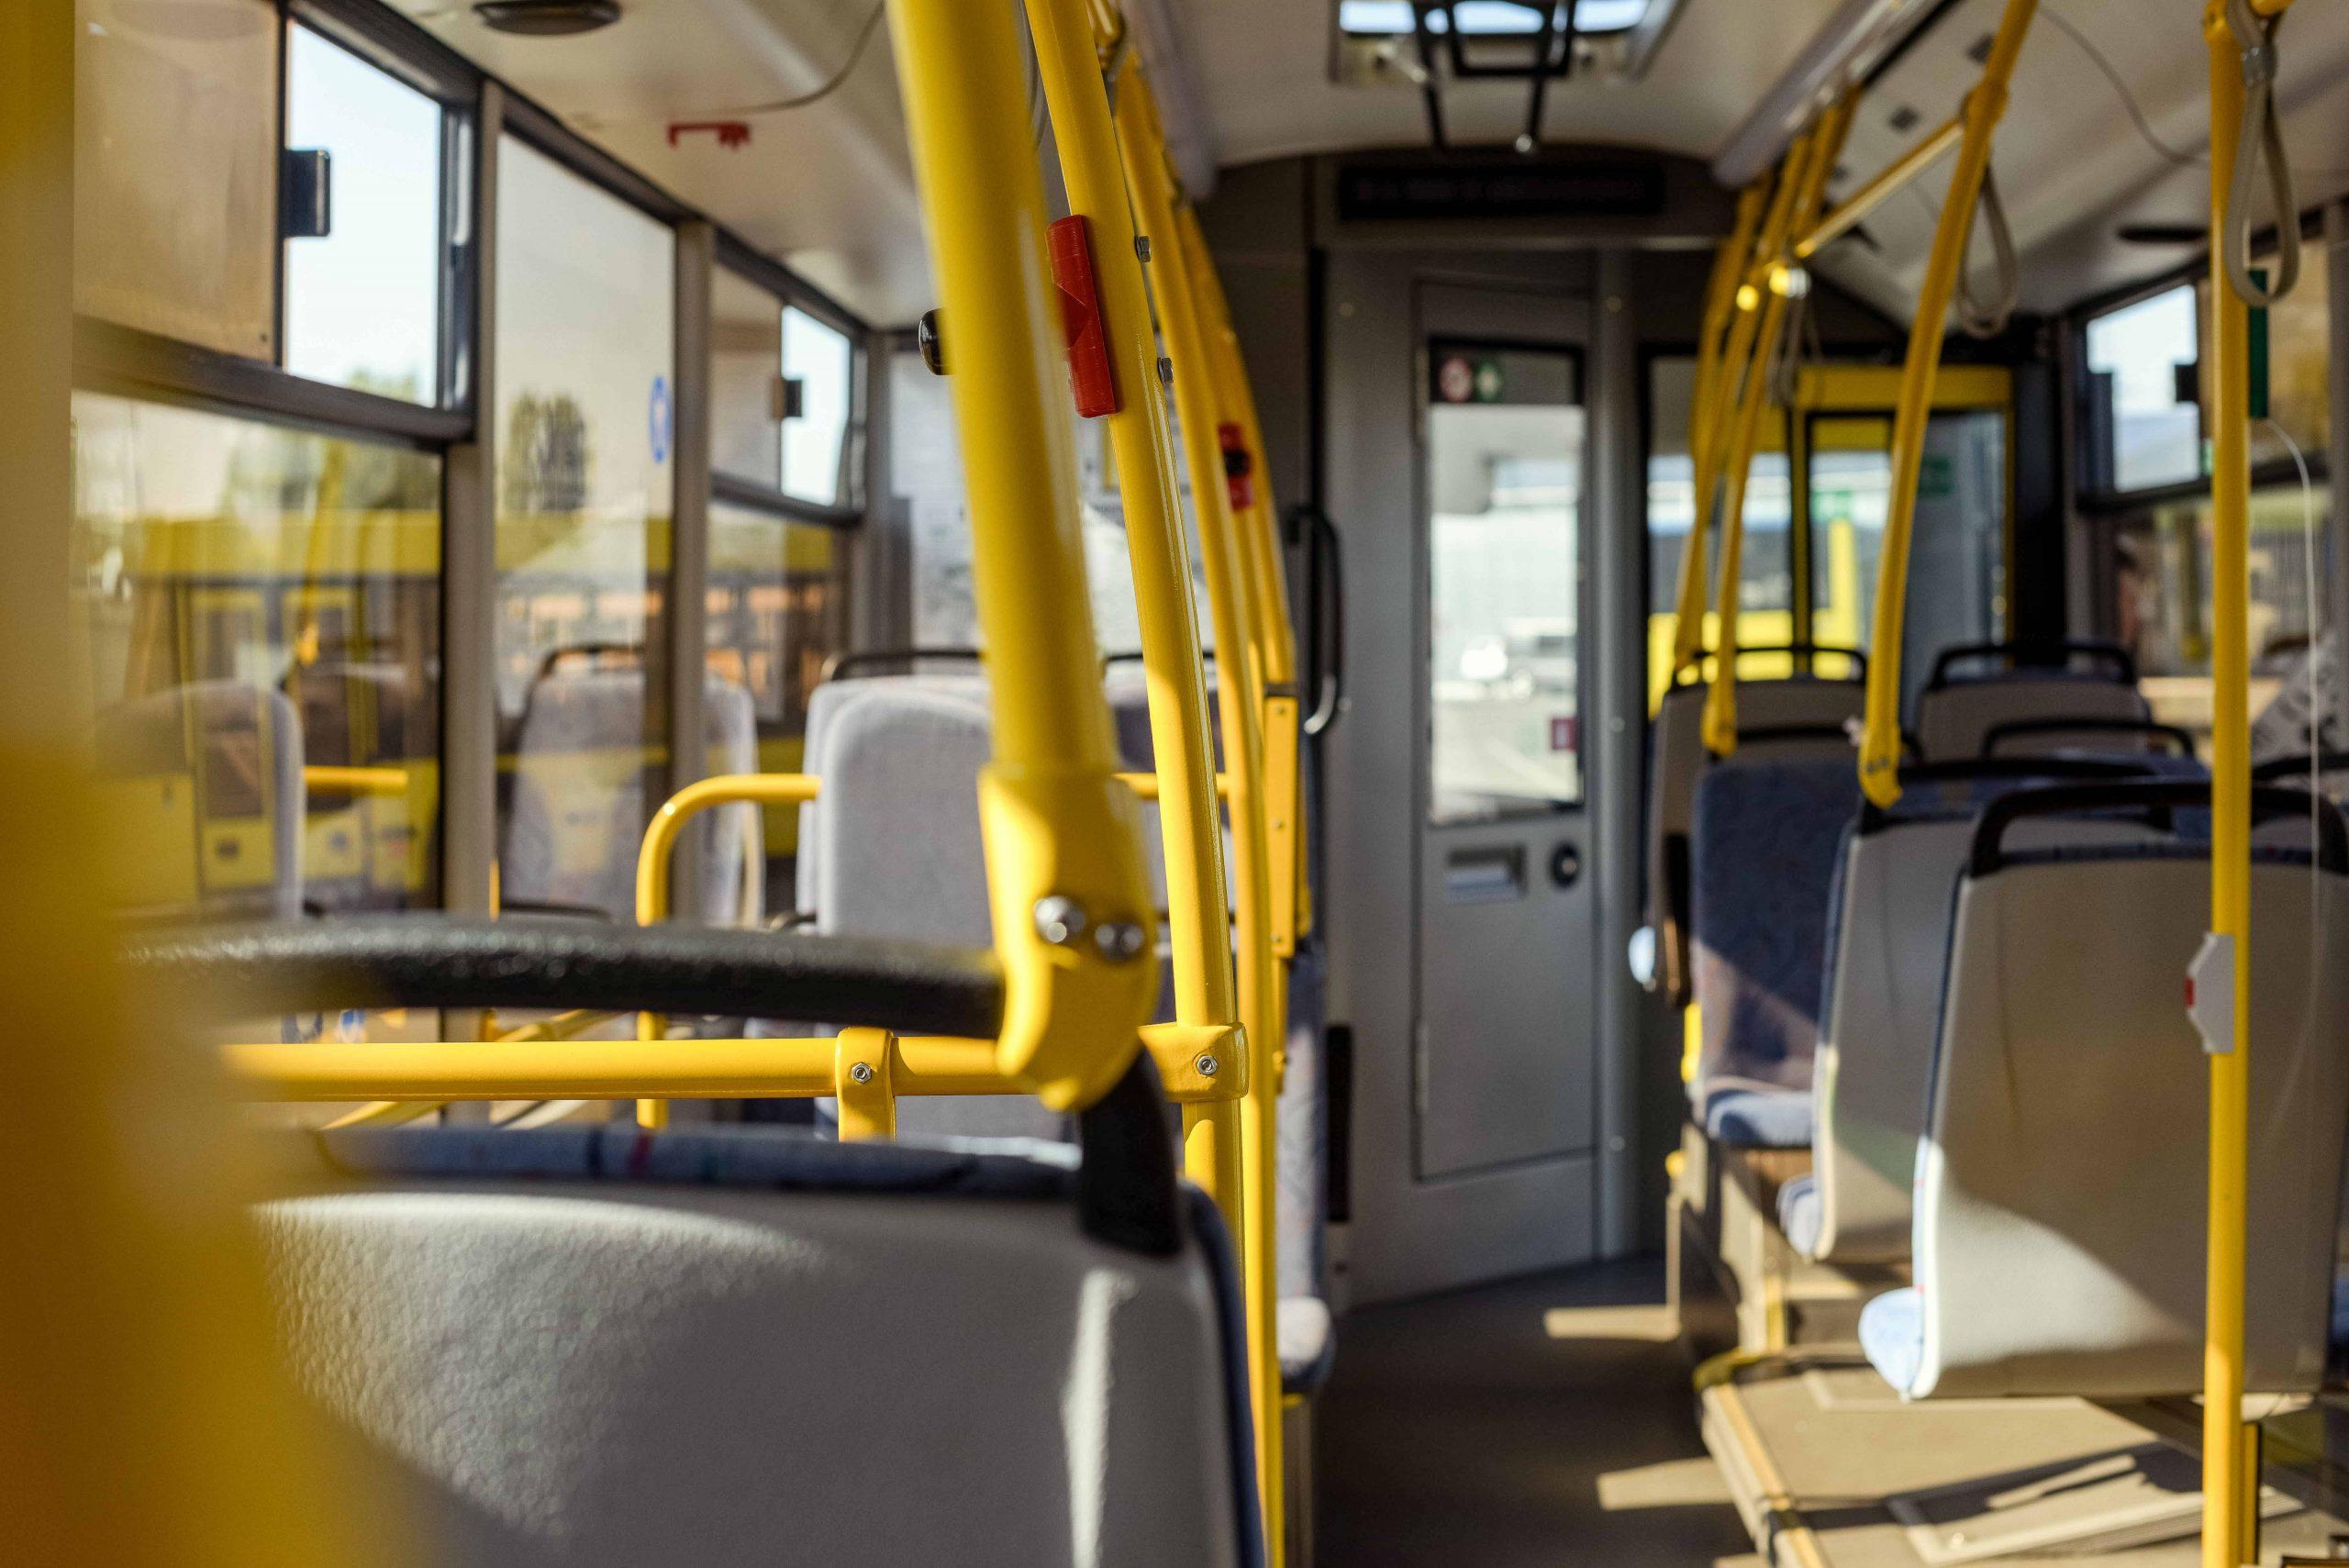 selective-focus-of-empty-city-bus-interior-with-se-YF57WWQ-min